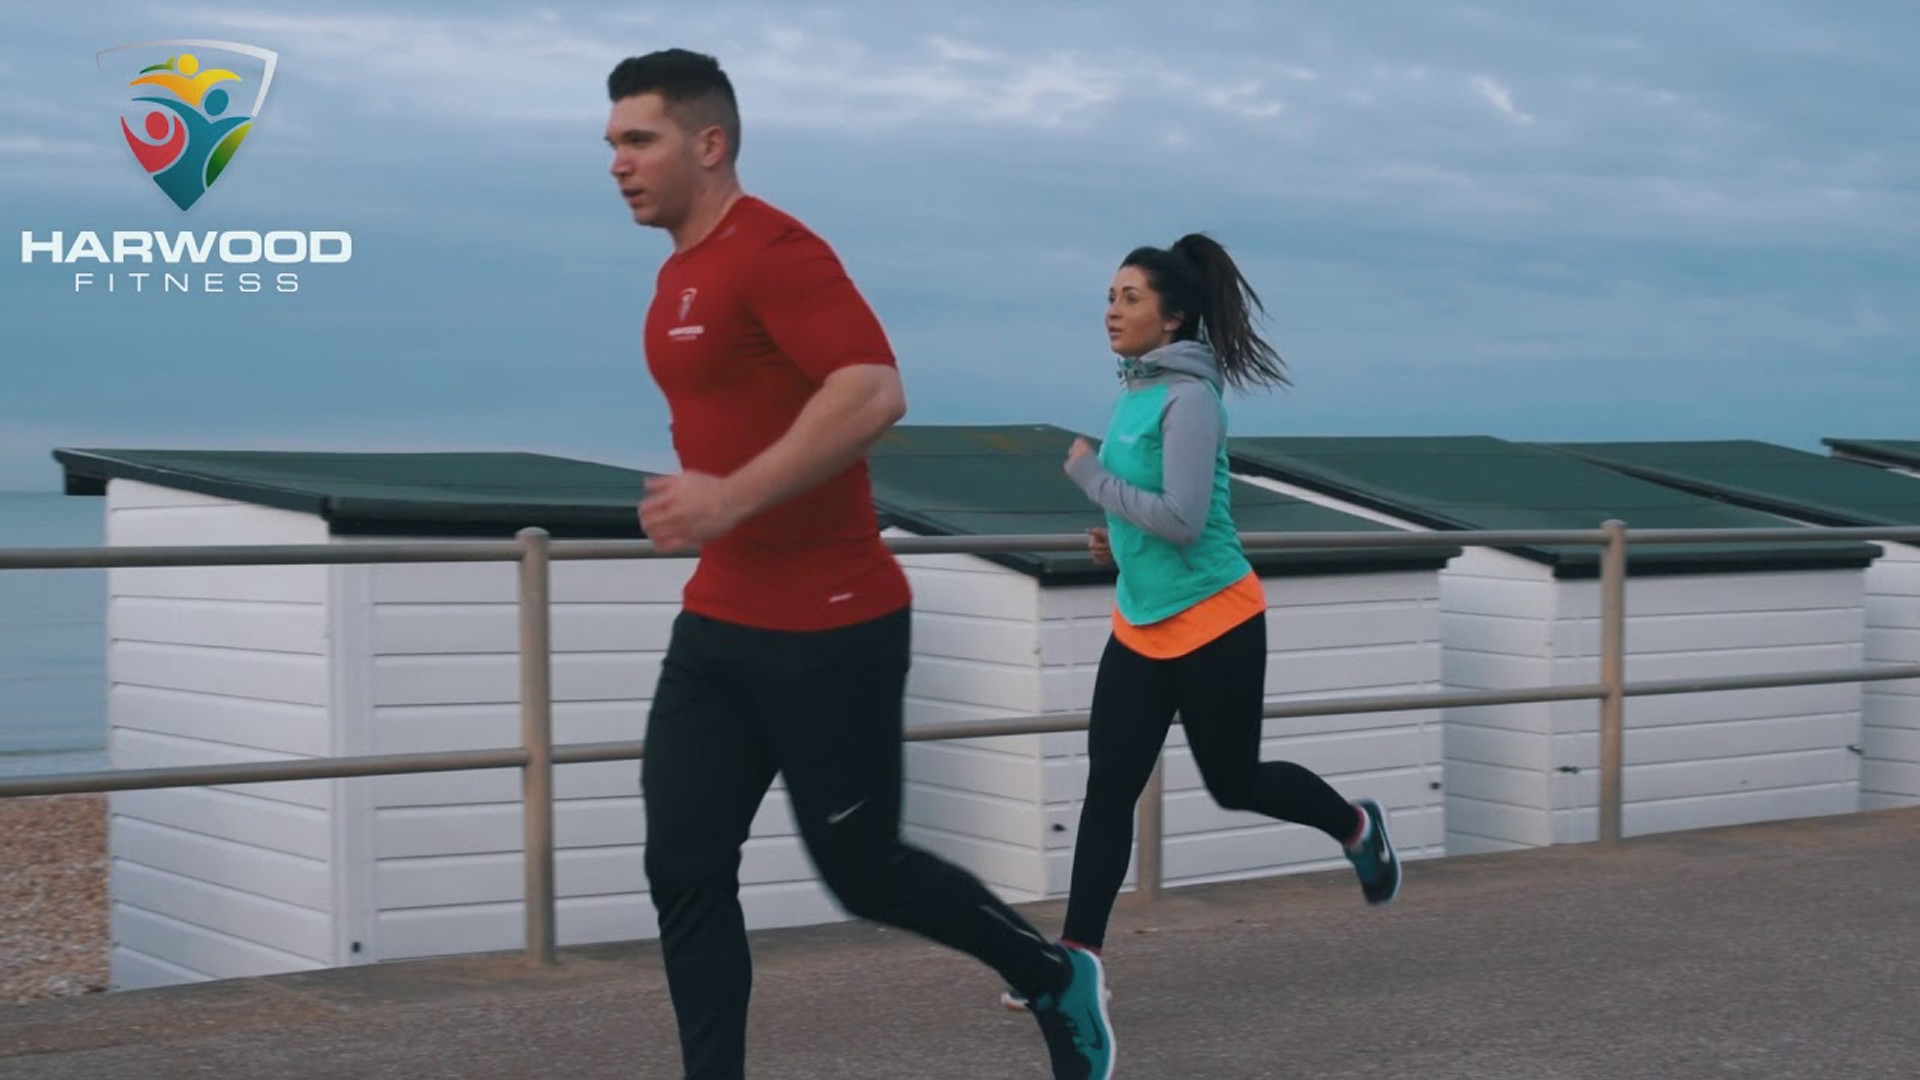 Harwood fitness Promo